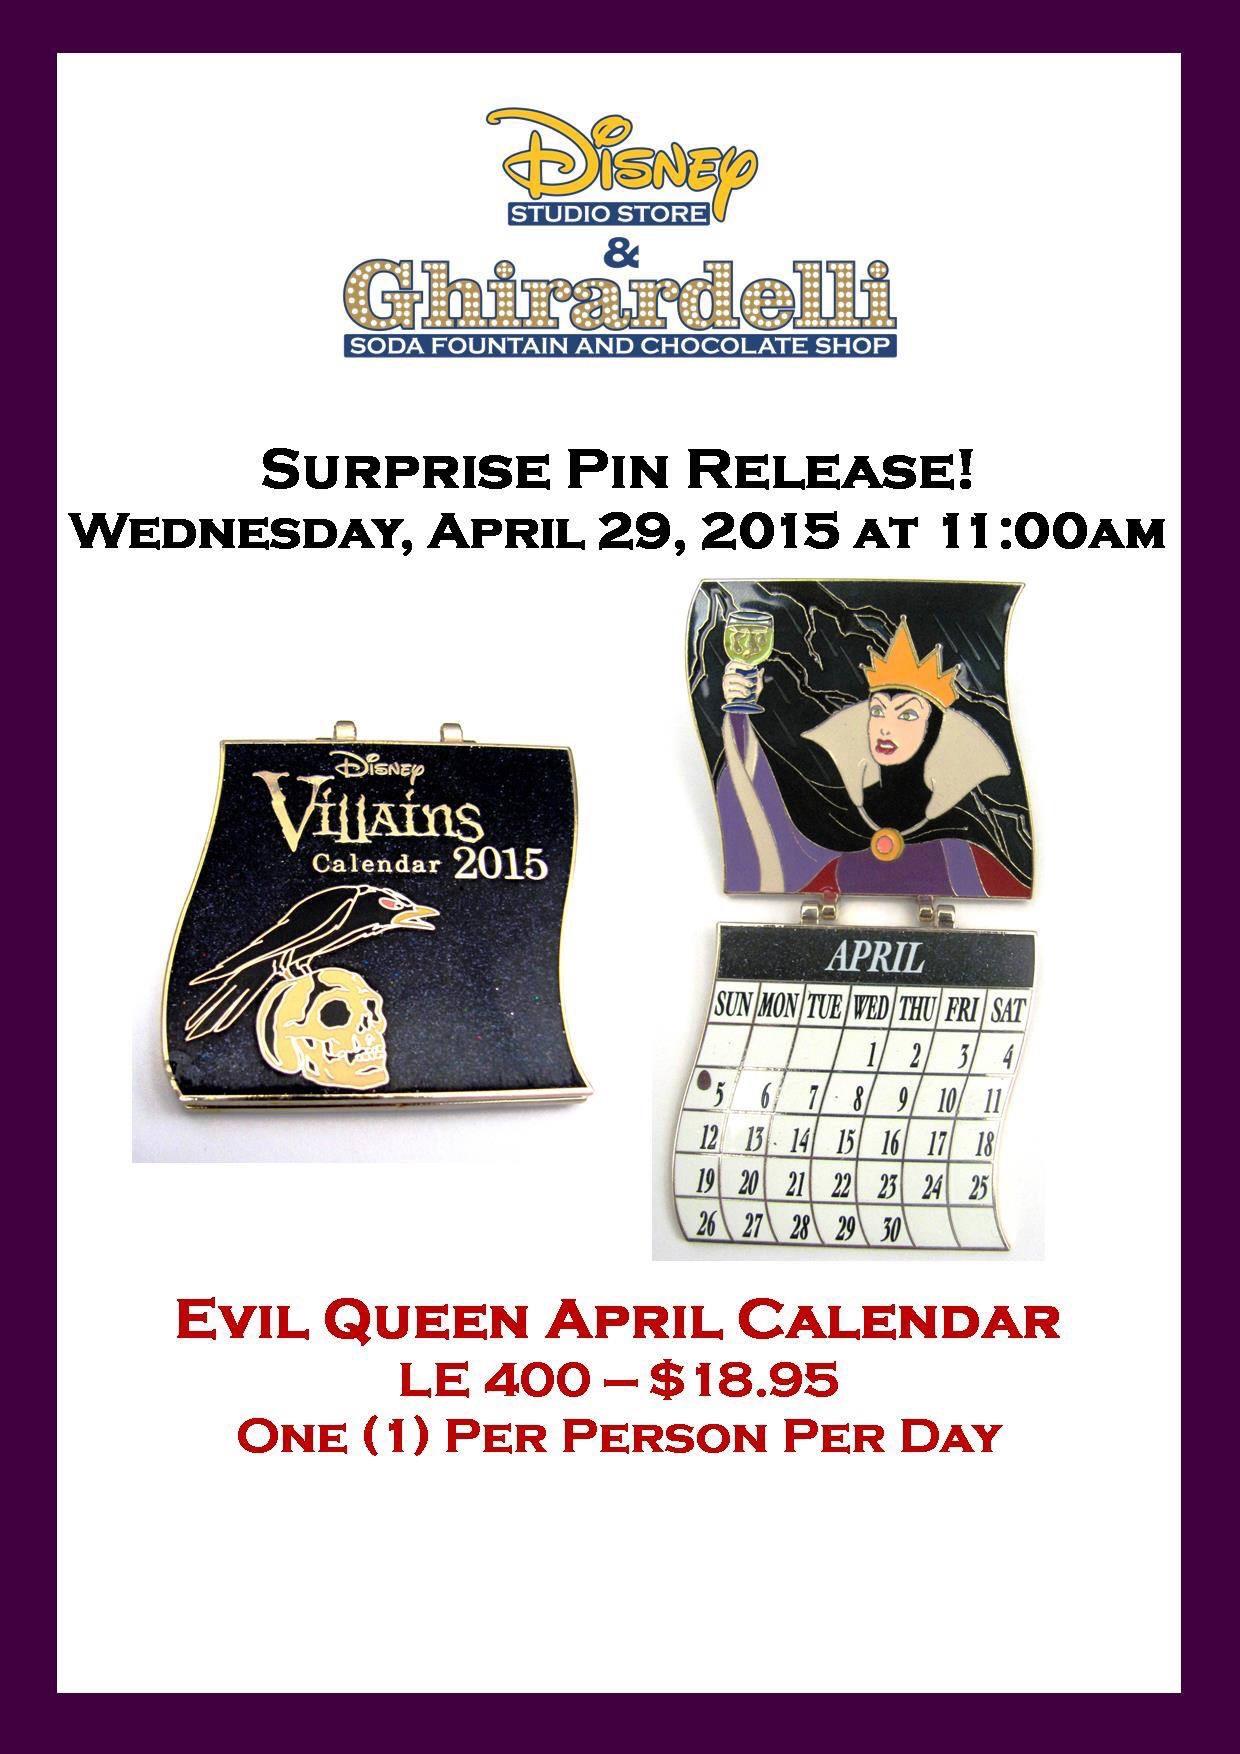 Surprise Evil Queen Pin Released At Disney Studio Store